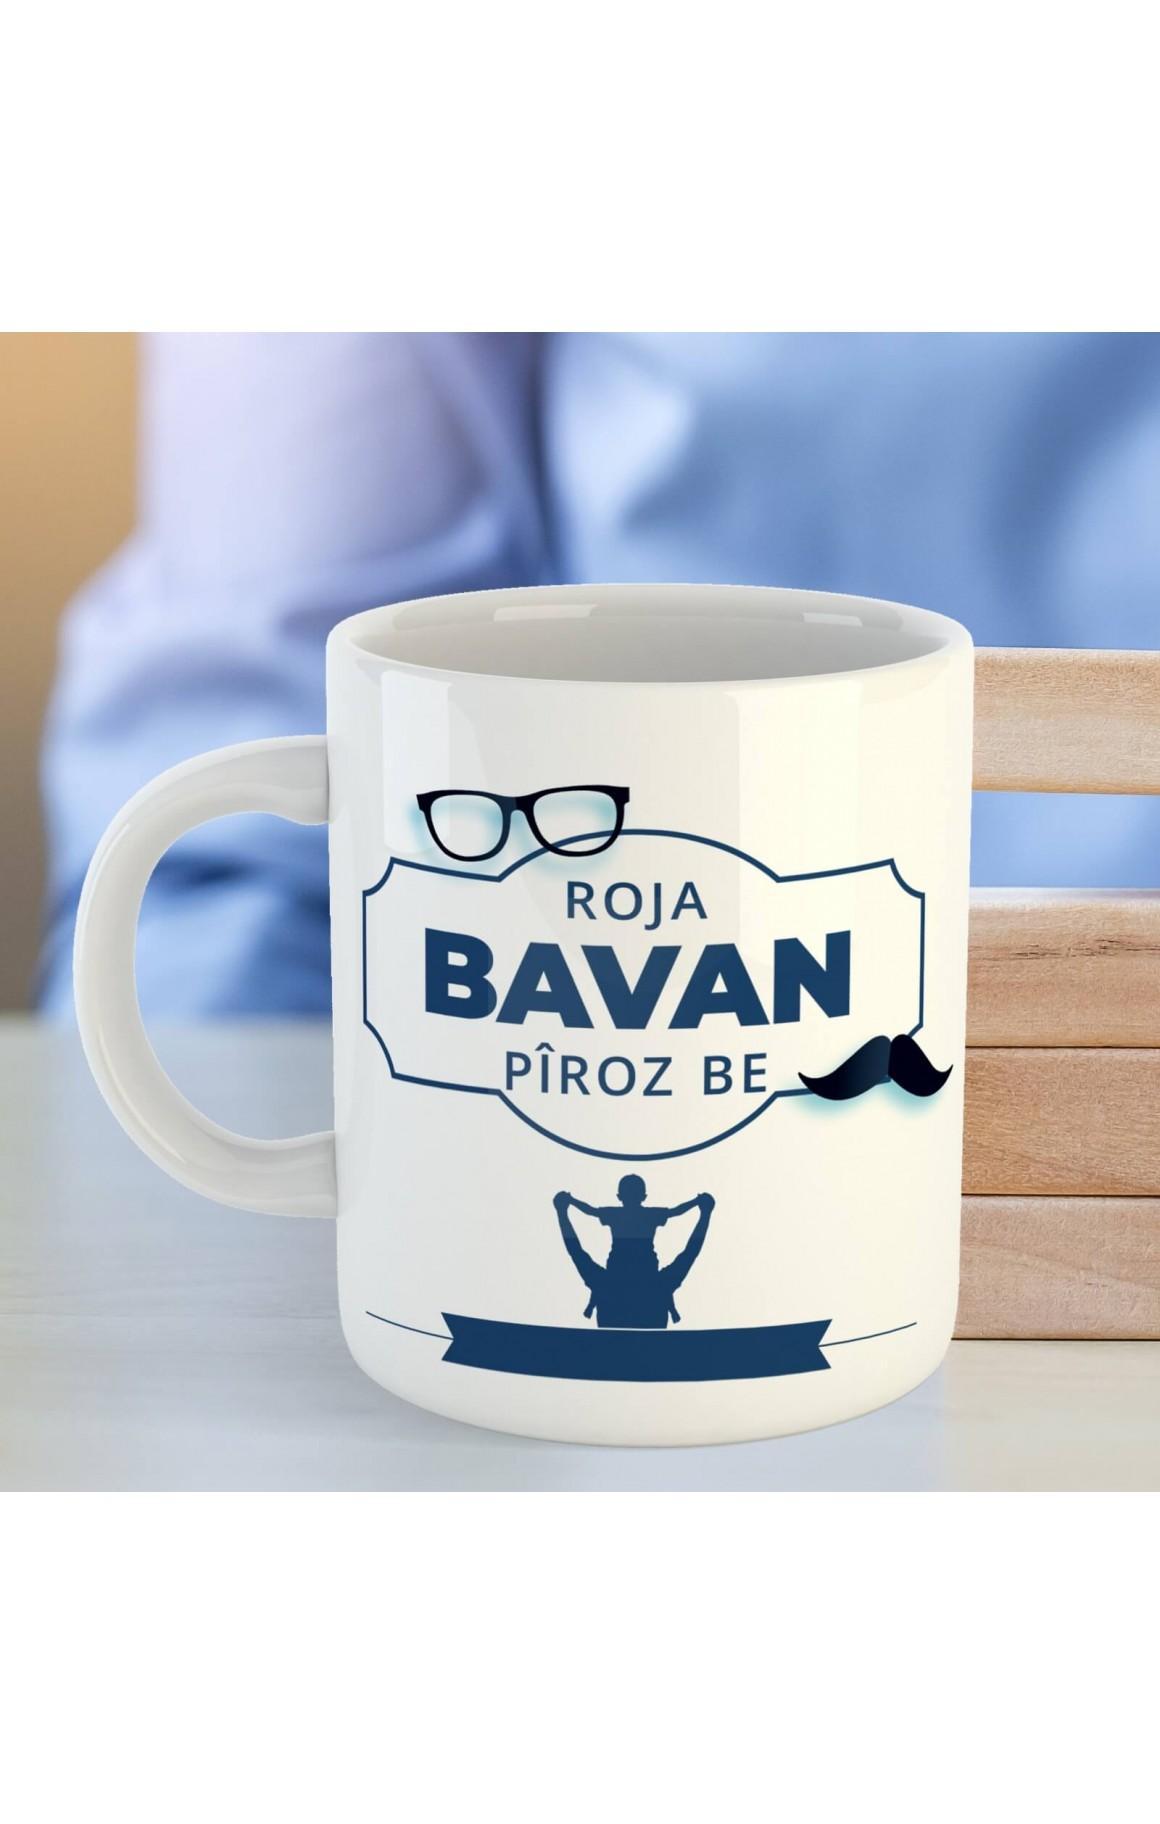 Babalara Özel Porselen Kupa - Roja Bavan Pîroz be